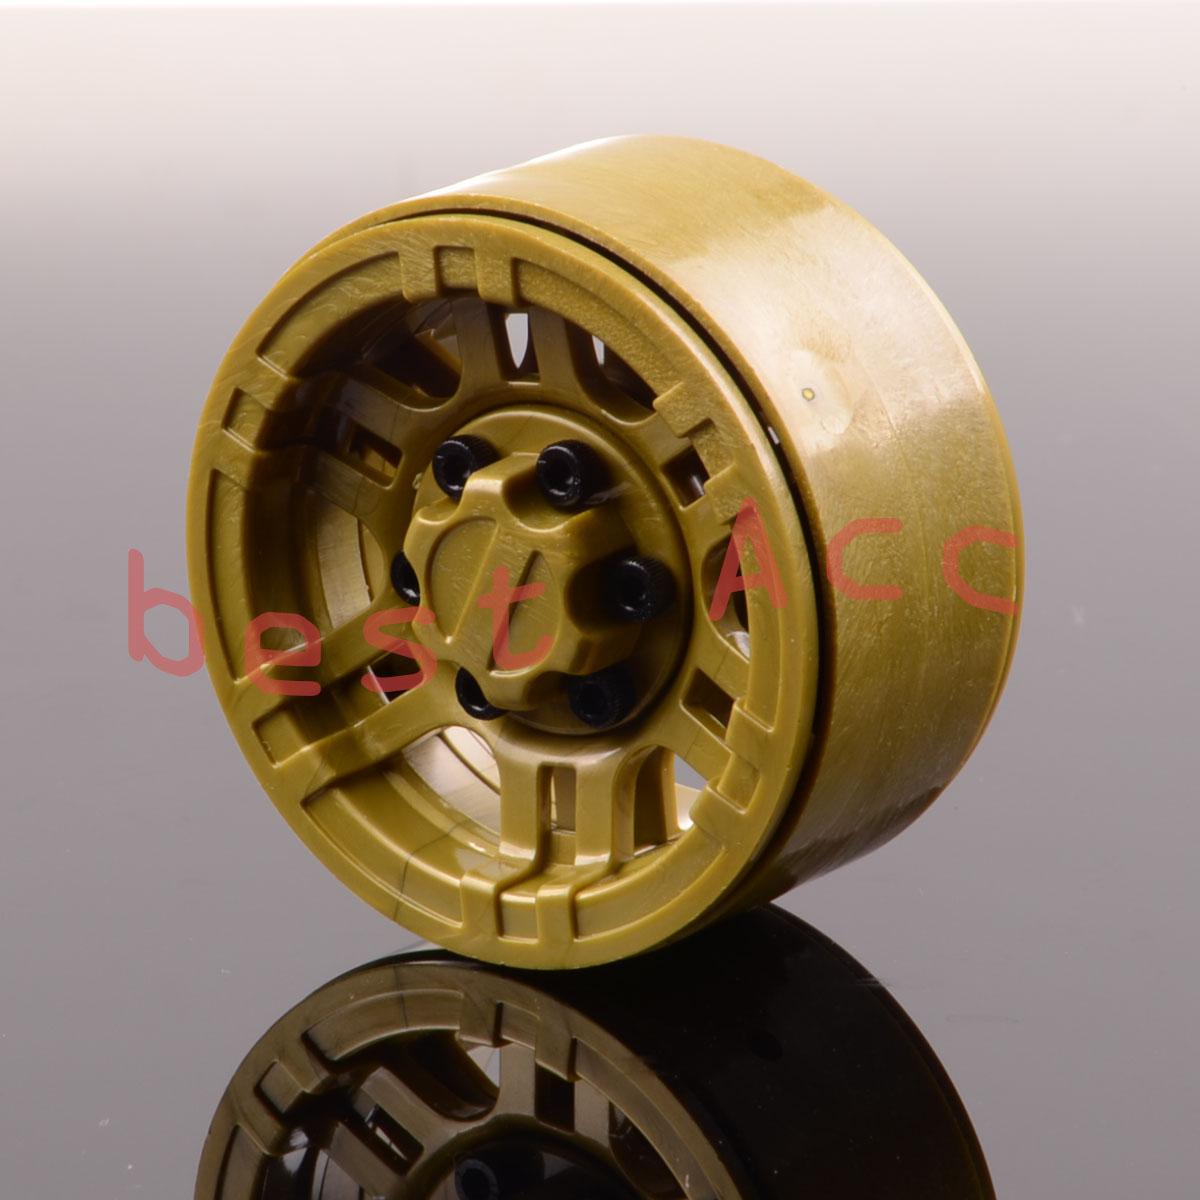 Silver Rock Crawler 1.9 Inch Beadlock Wheels For Gmade D90 SCX10 617 4P RC 1:10